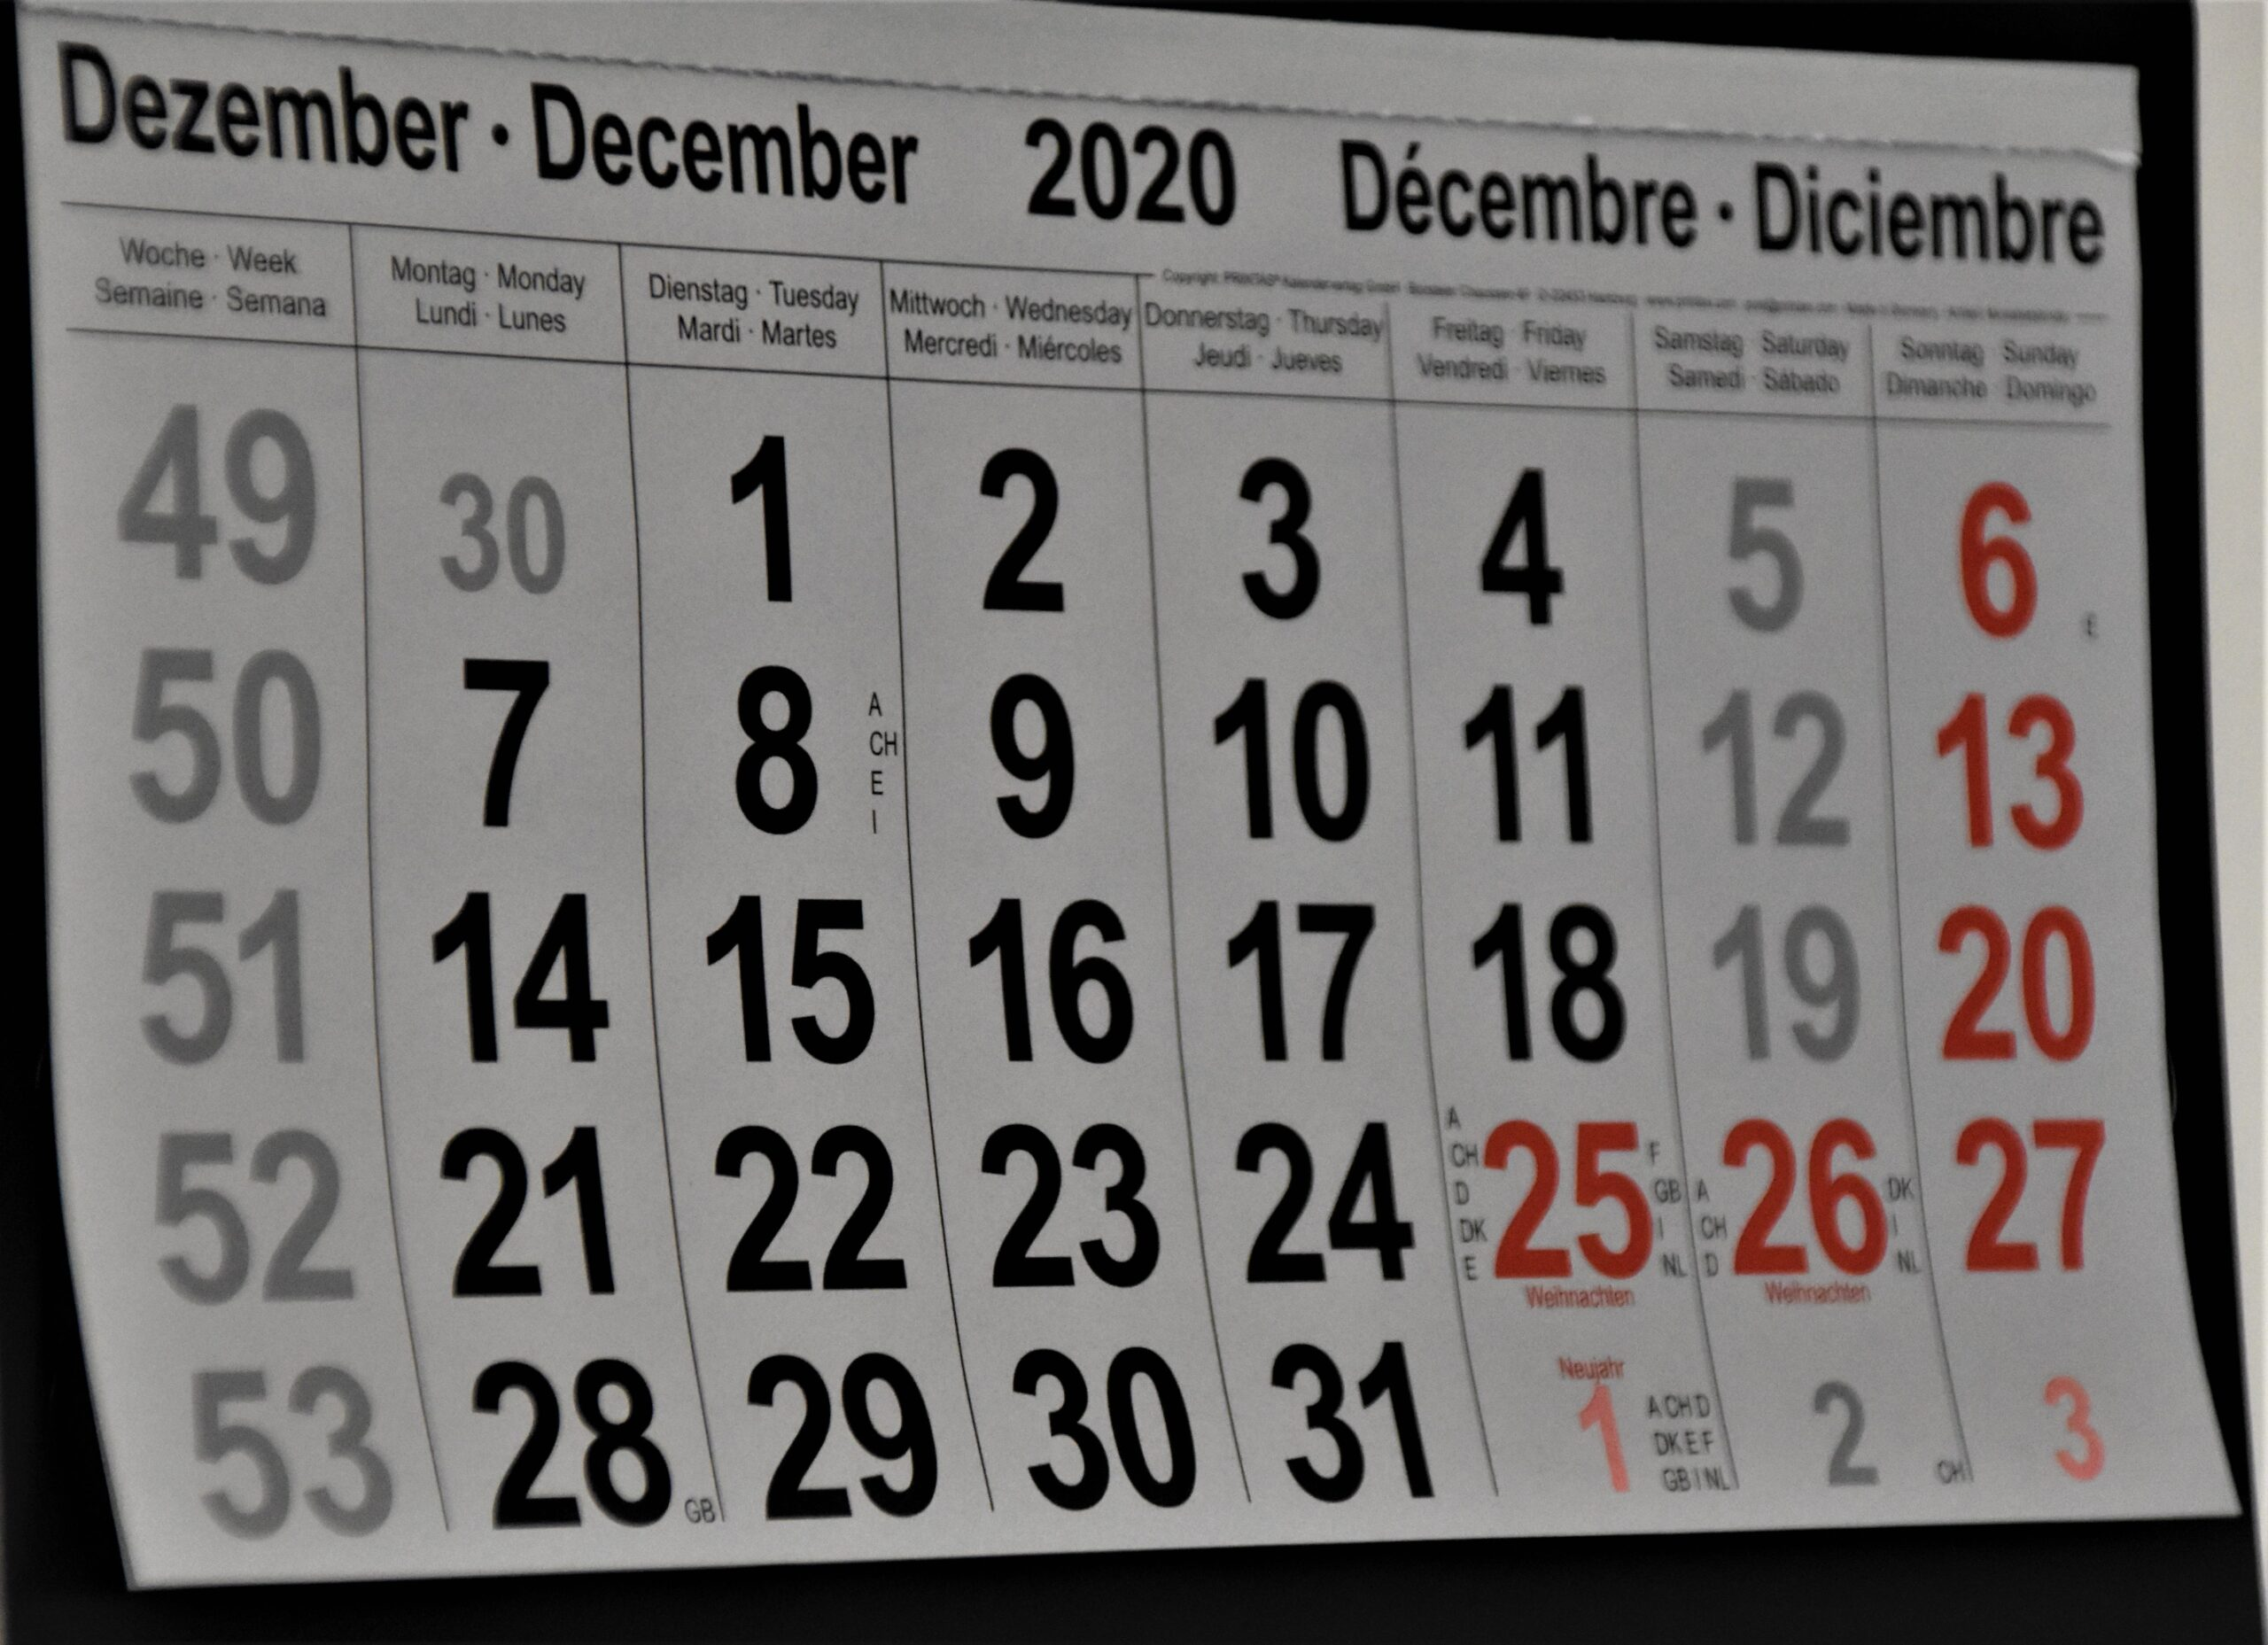 A very brief summary of 2020